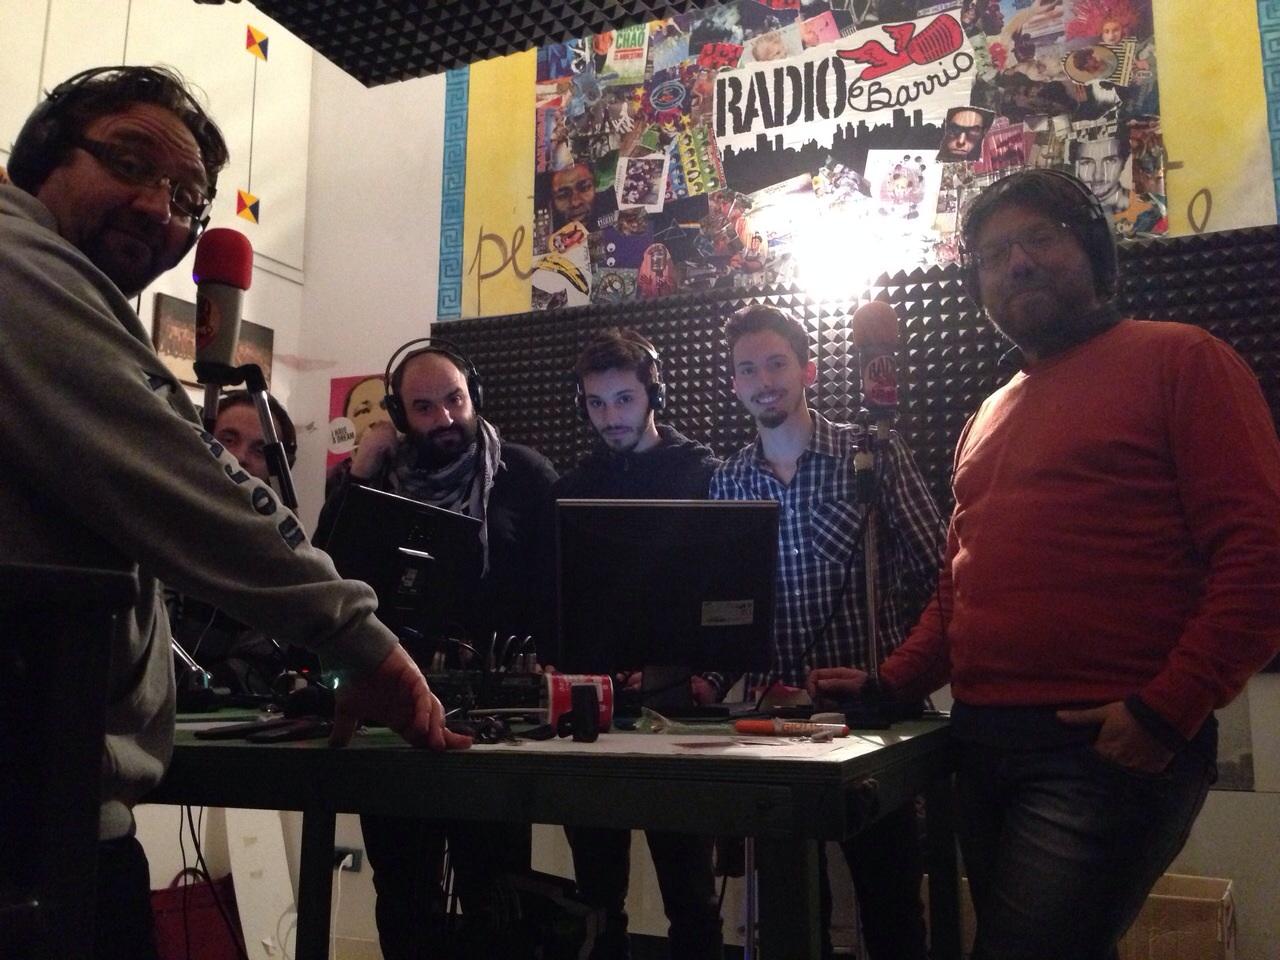 Radio Barrio compie due anni